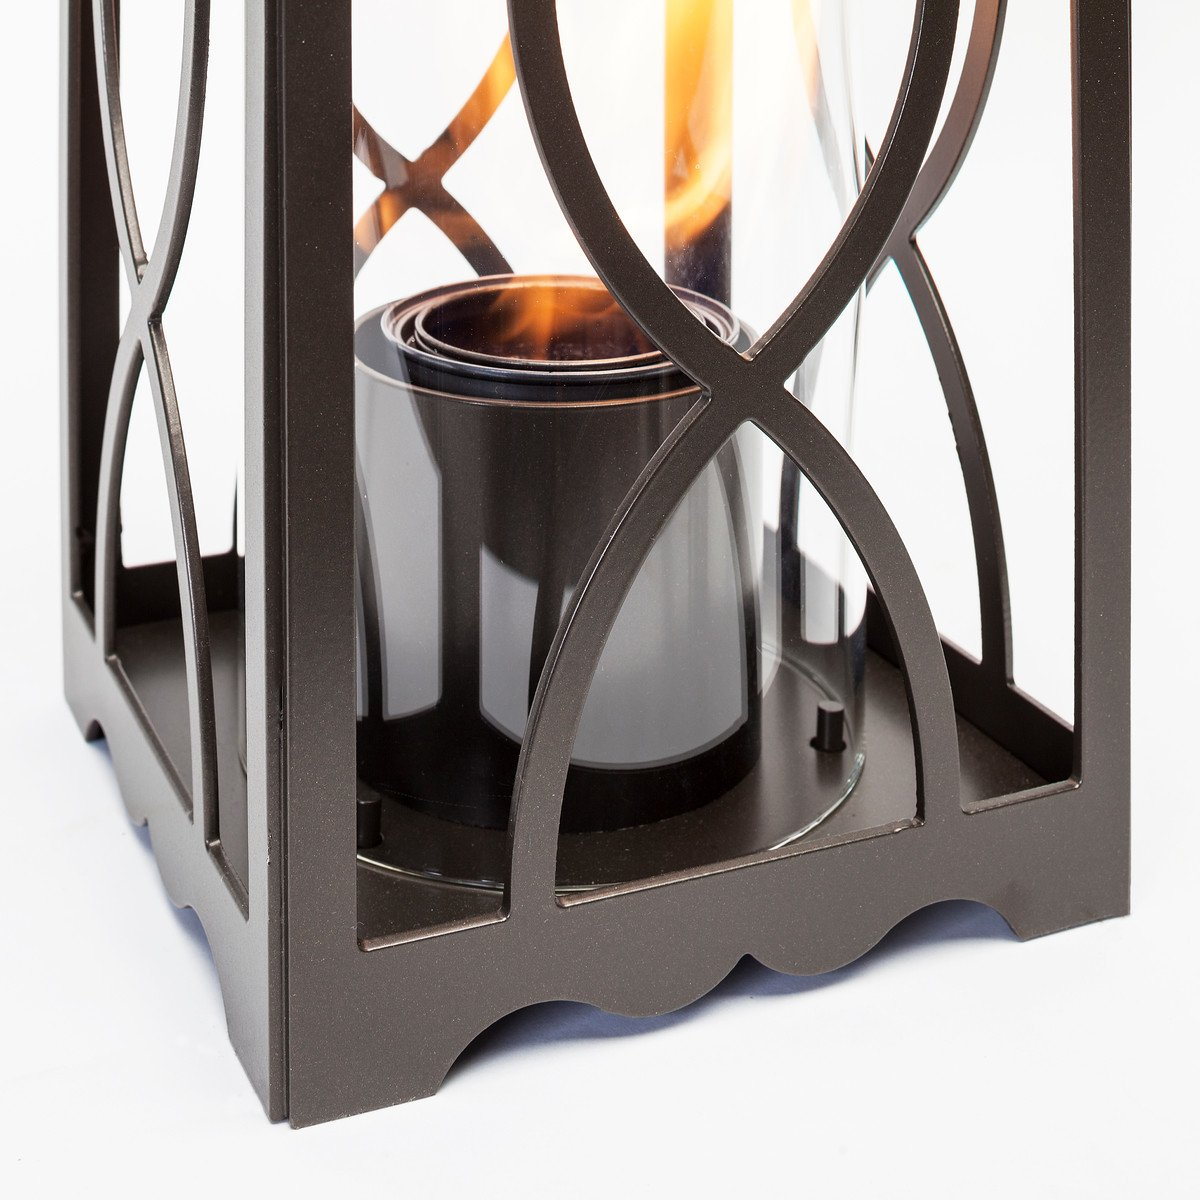 Terra Flame 700953164254 Augusta Collection Lantern, Medium-26.5in, Bronze by Terra Flame